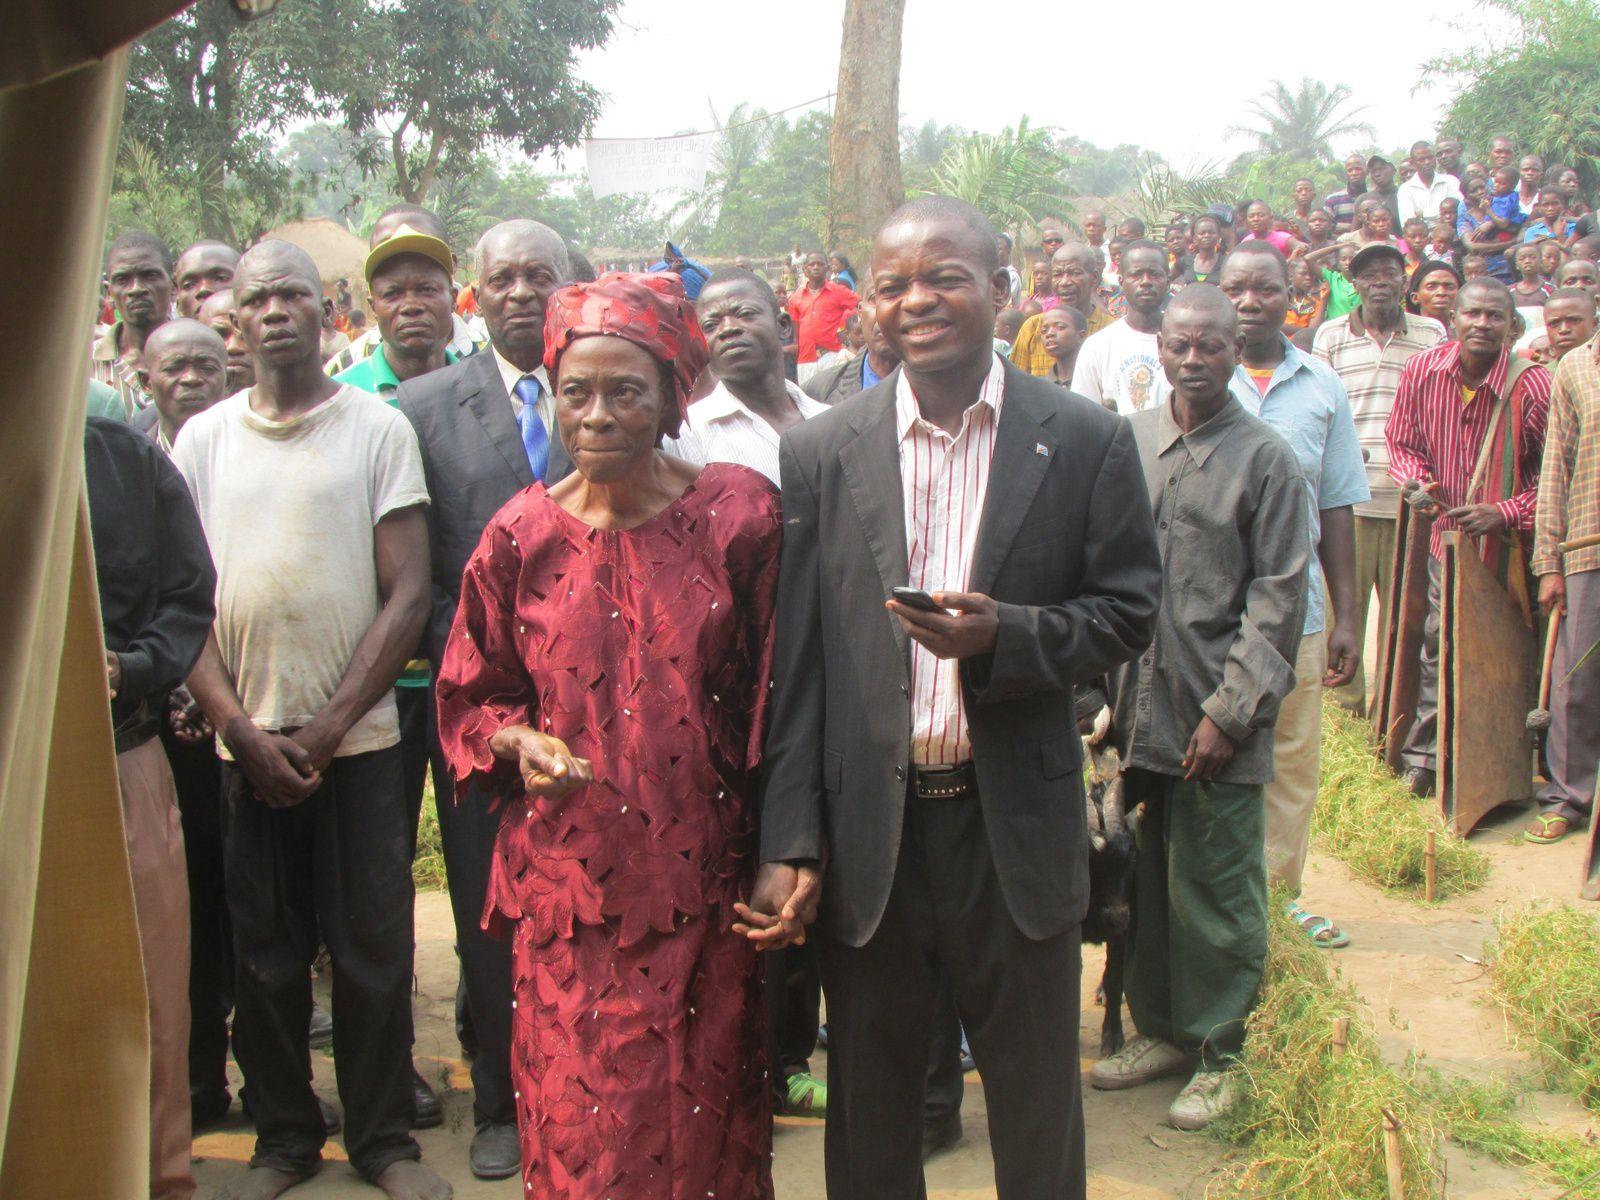 De G à D: Abbé Joseph LOKADI, Mgr Nicolas DJOMO et Mgr Albert HIOMBO.